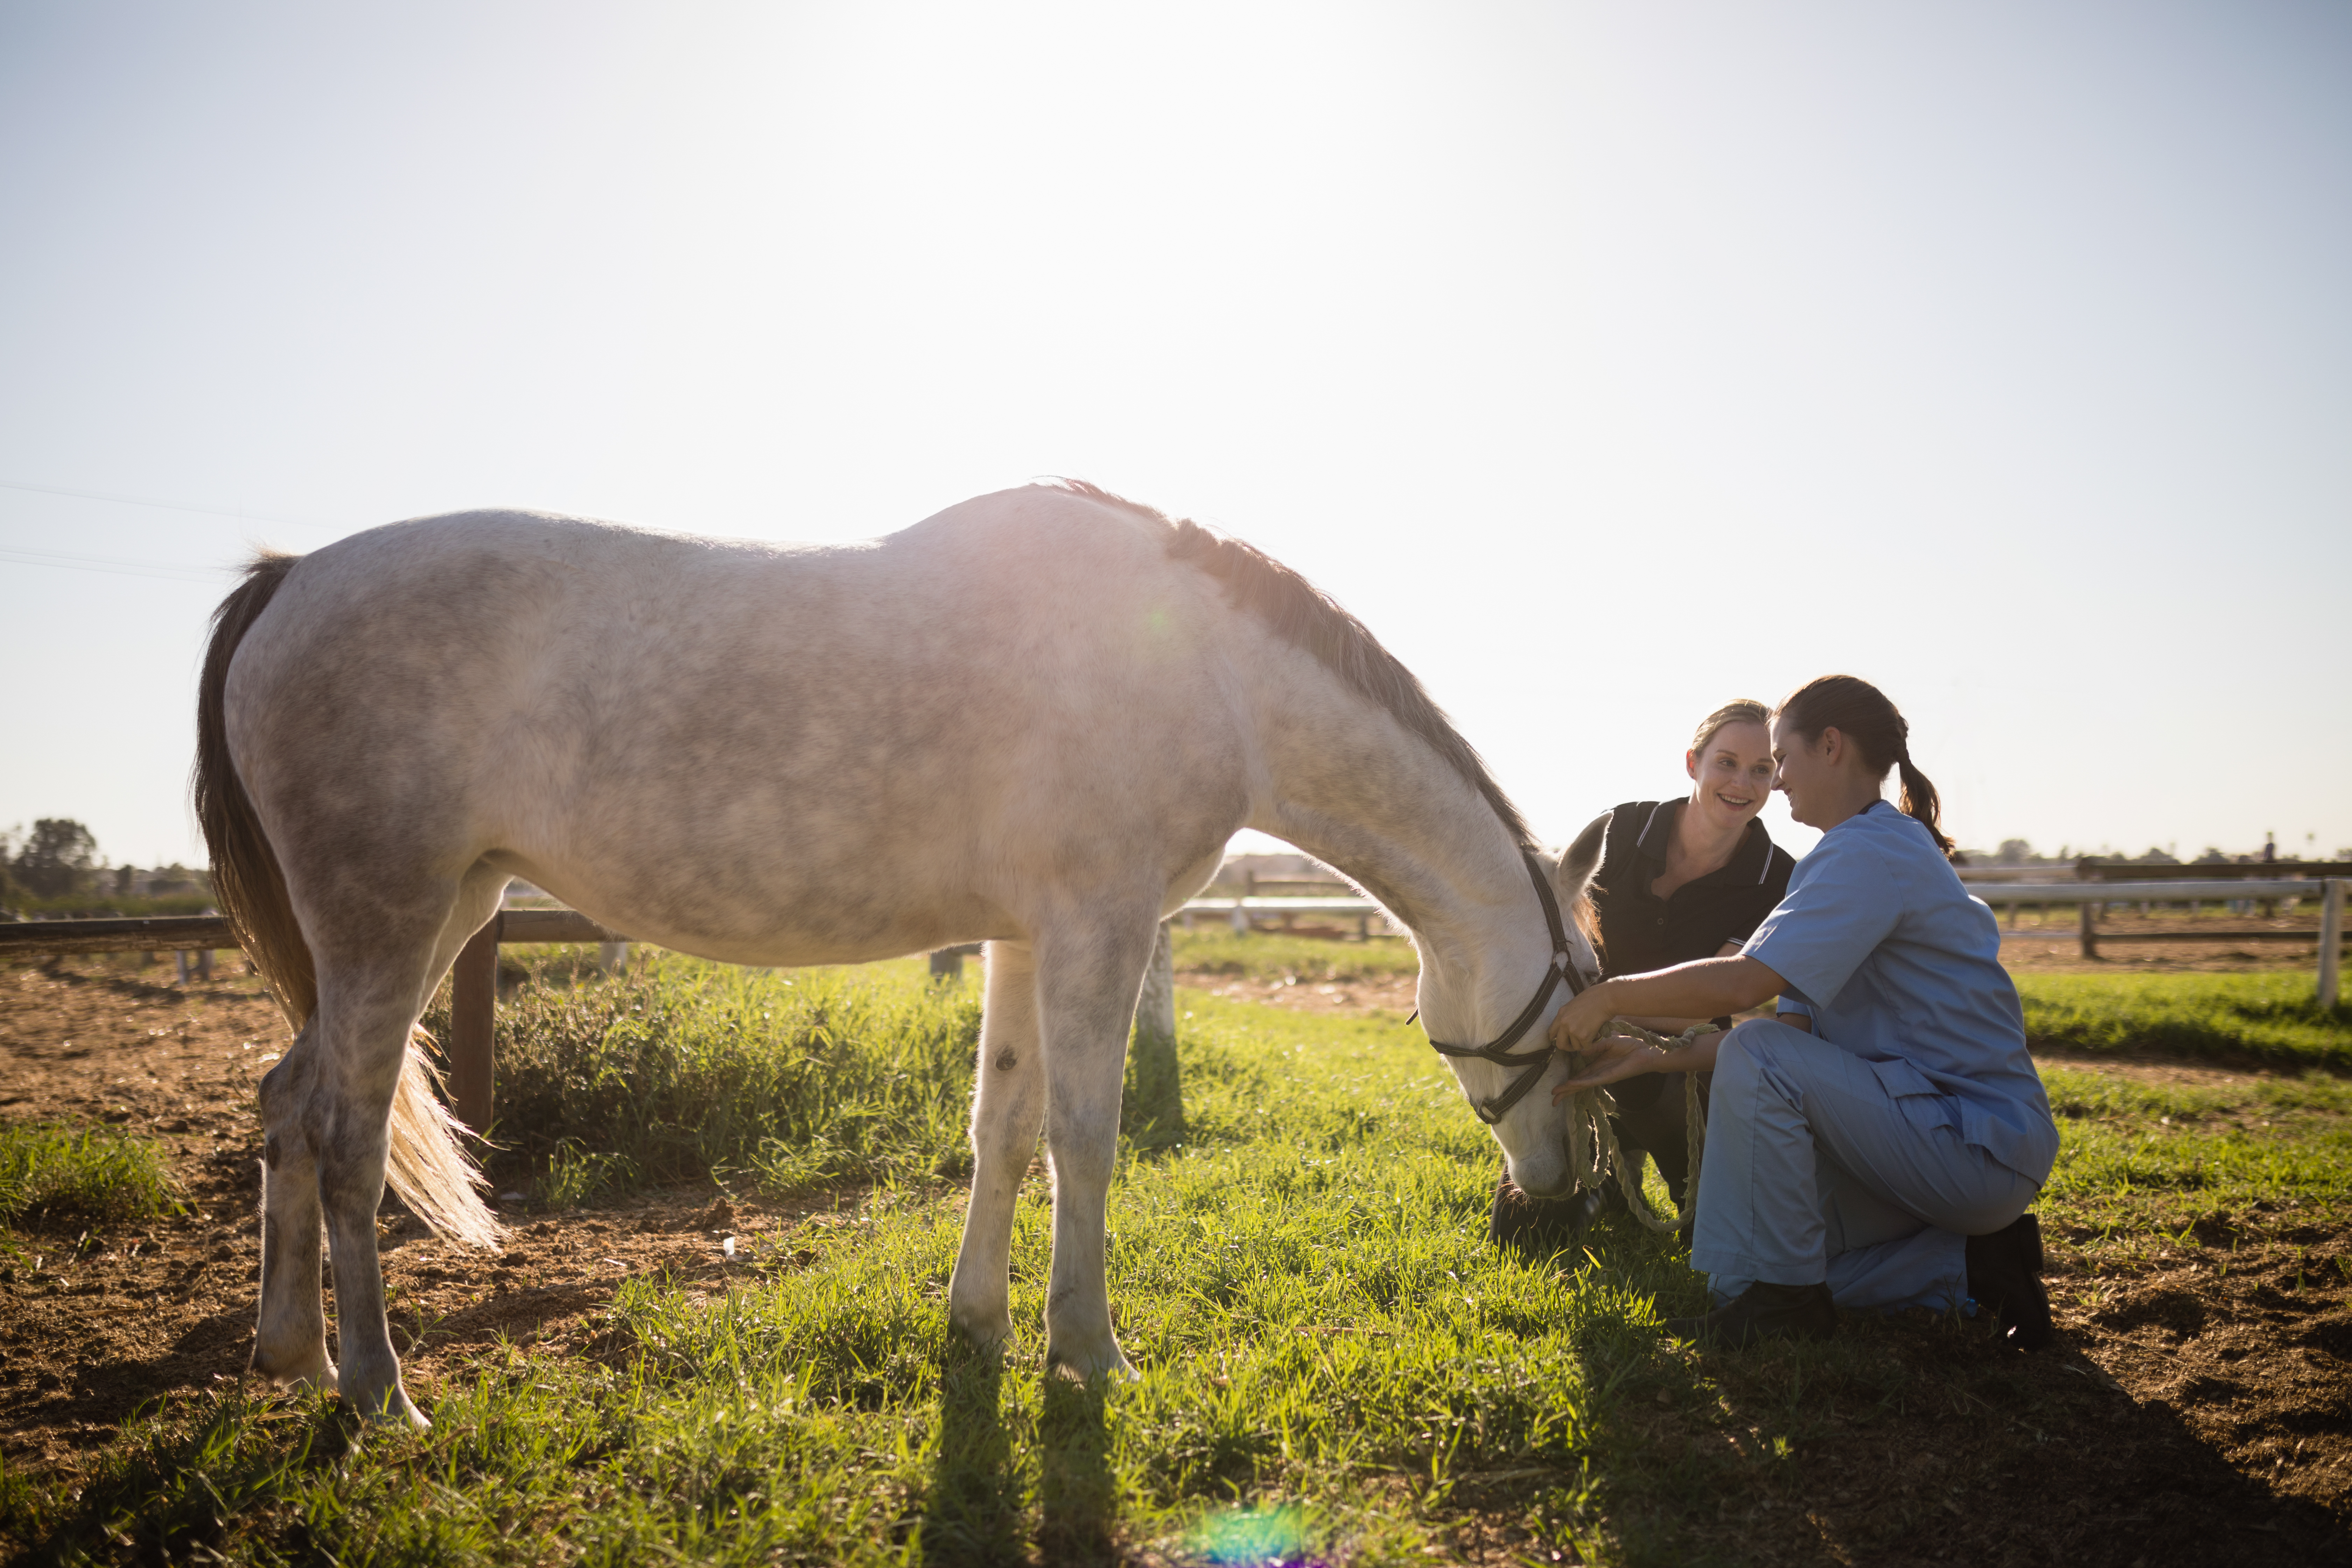 Women examining a horse